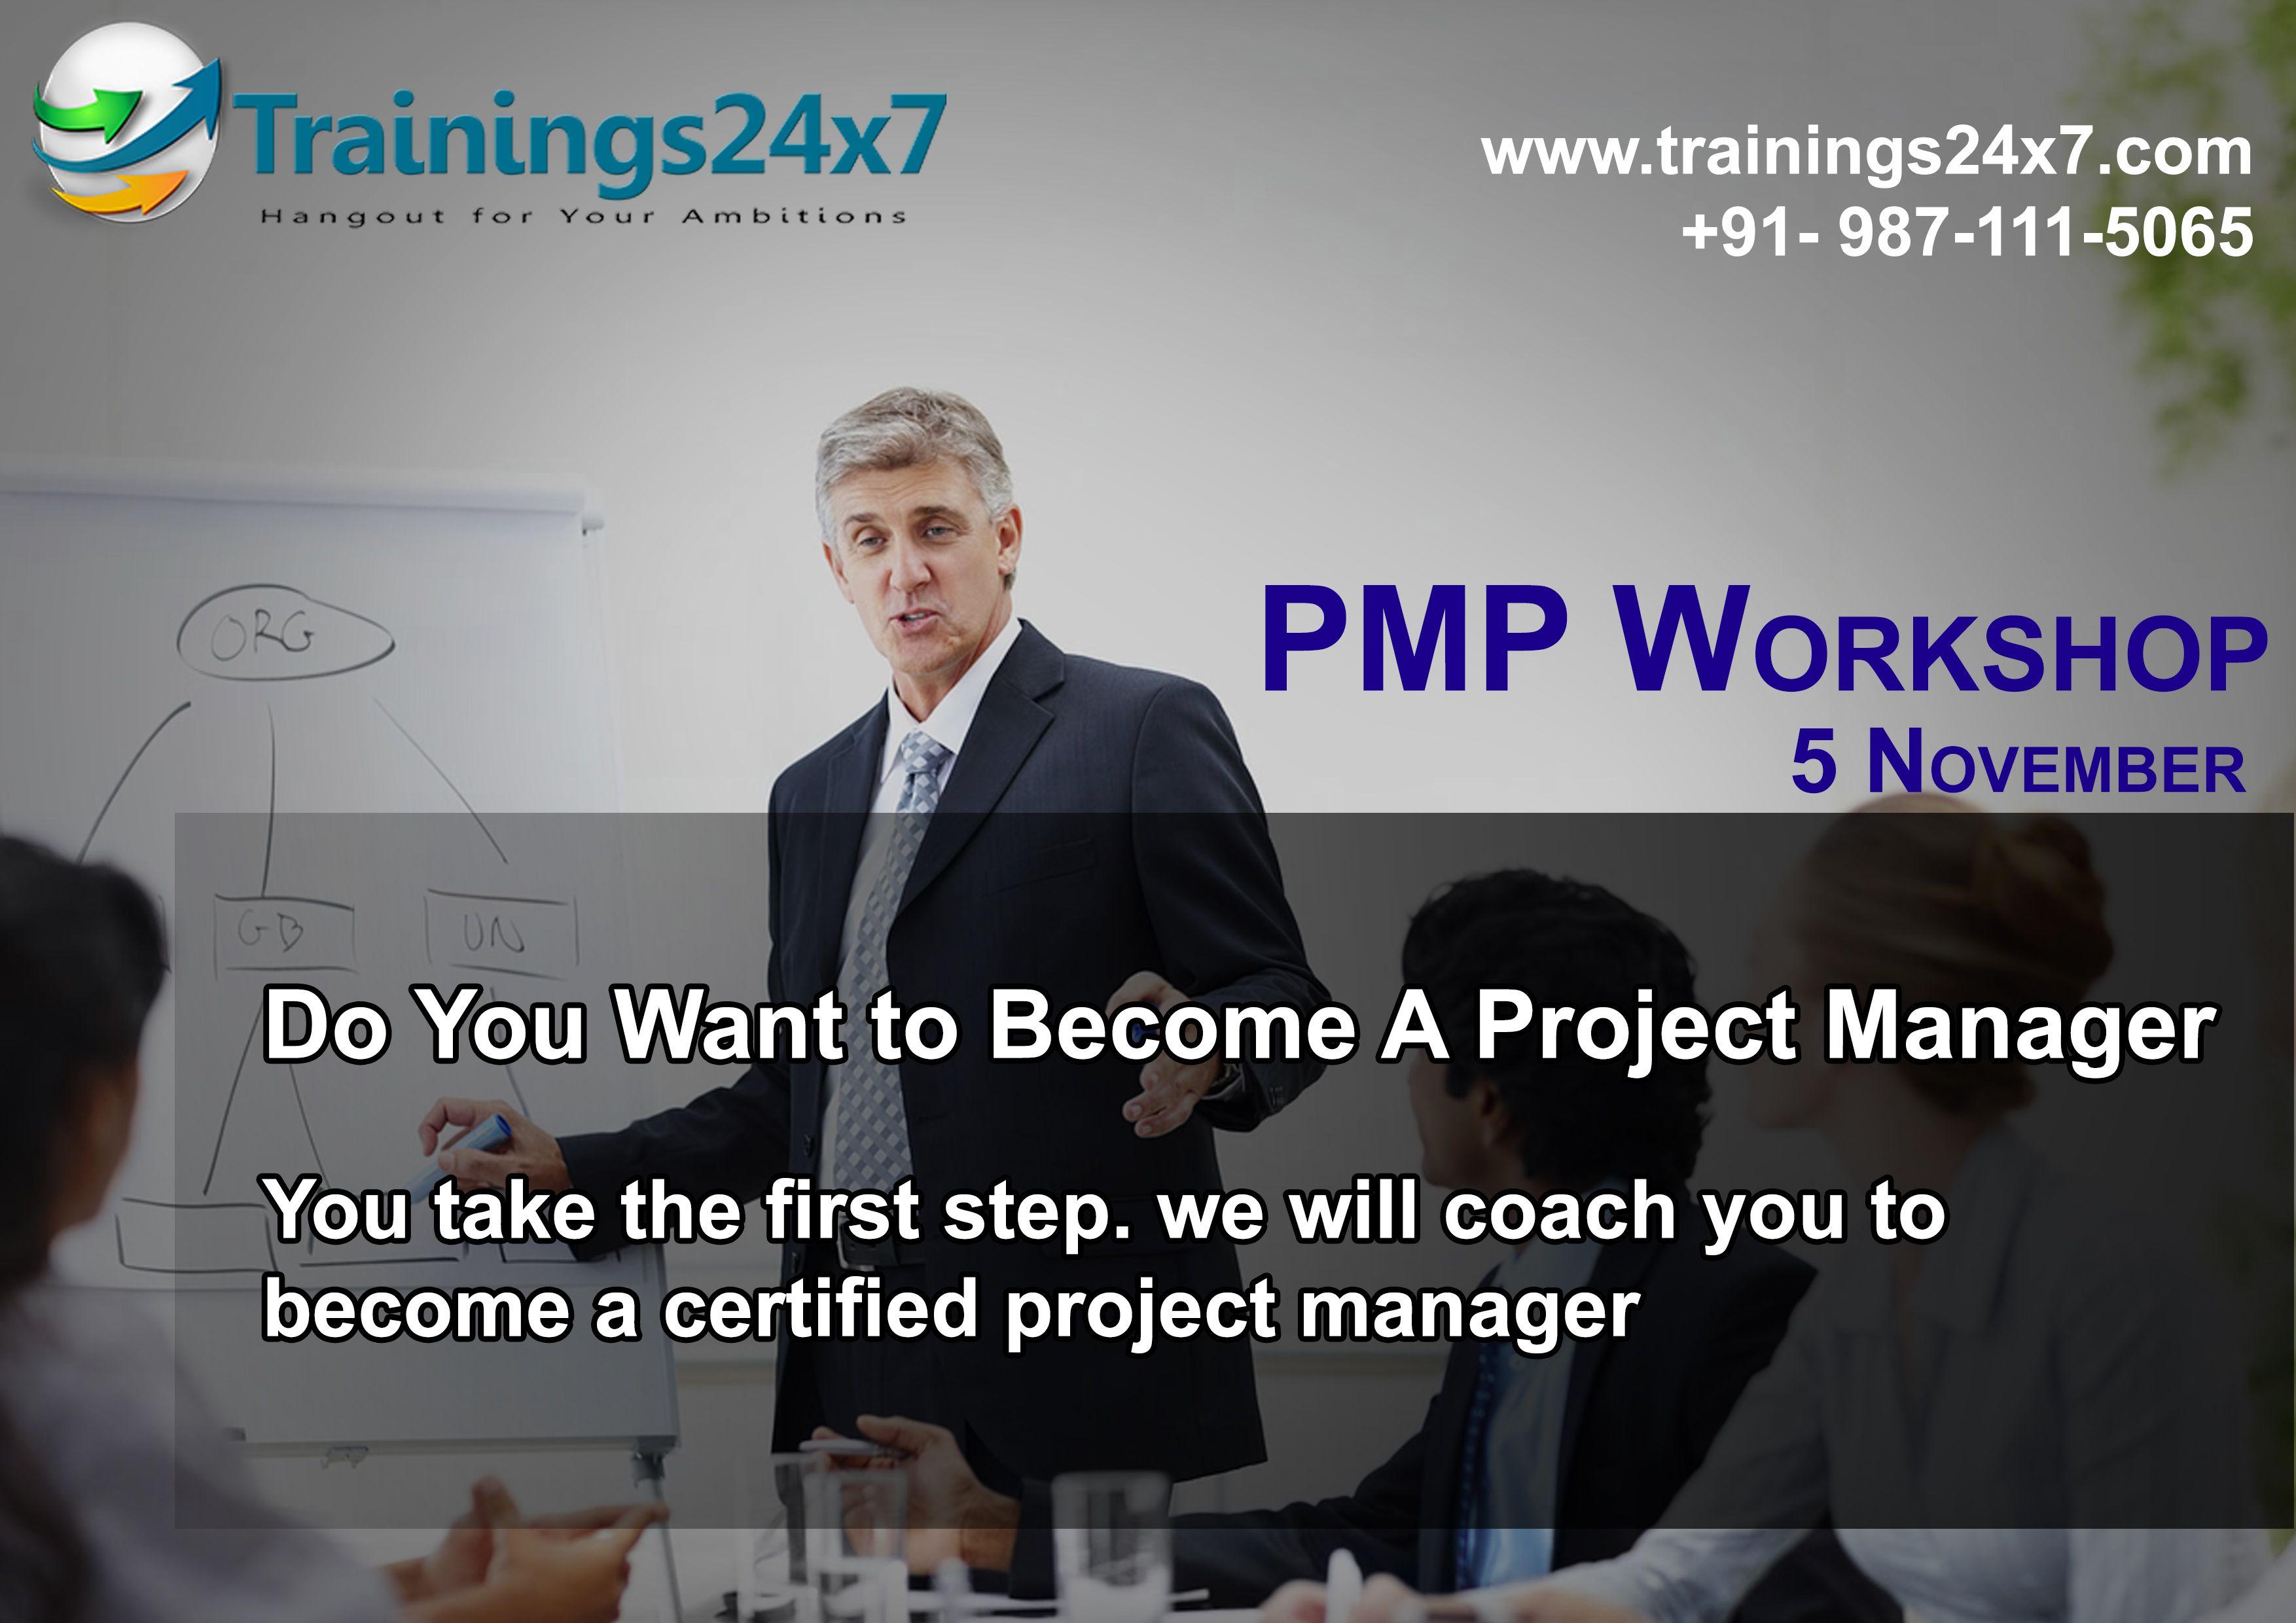 Pmp workshop in delhi httptrainings24x7pmp certification pmp workshop in delhi httptrainings24x7pmp certification workshop training 1betcityfo Images